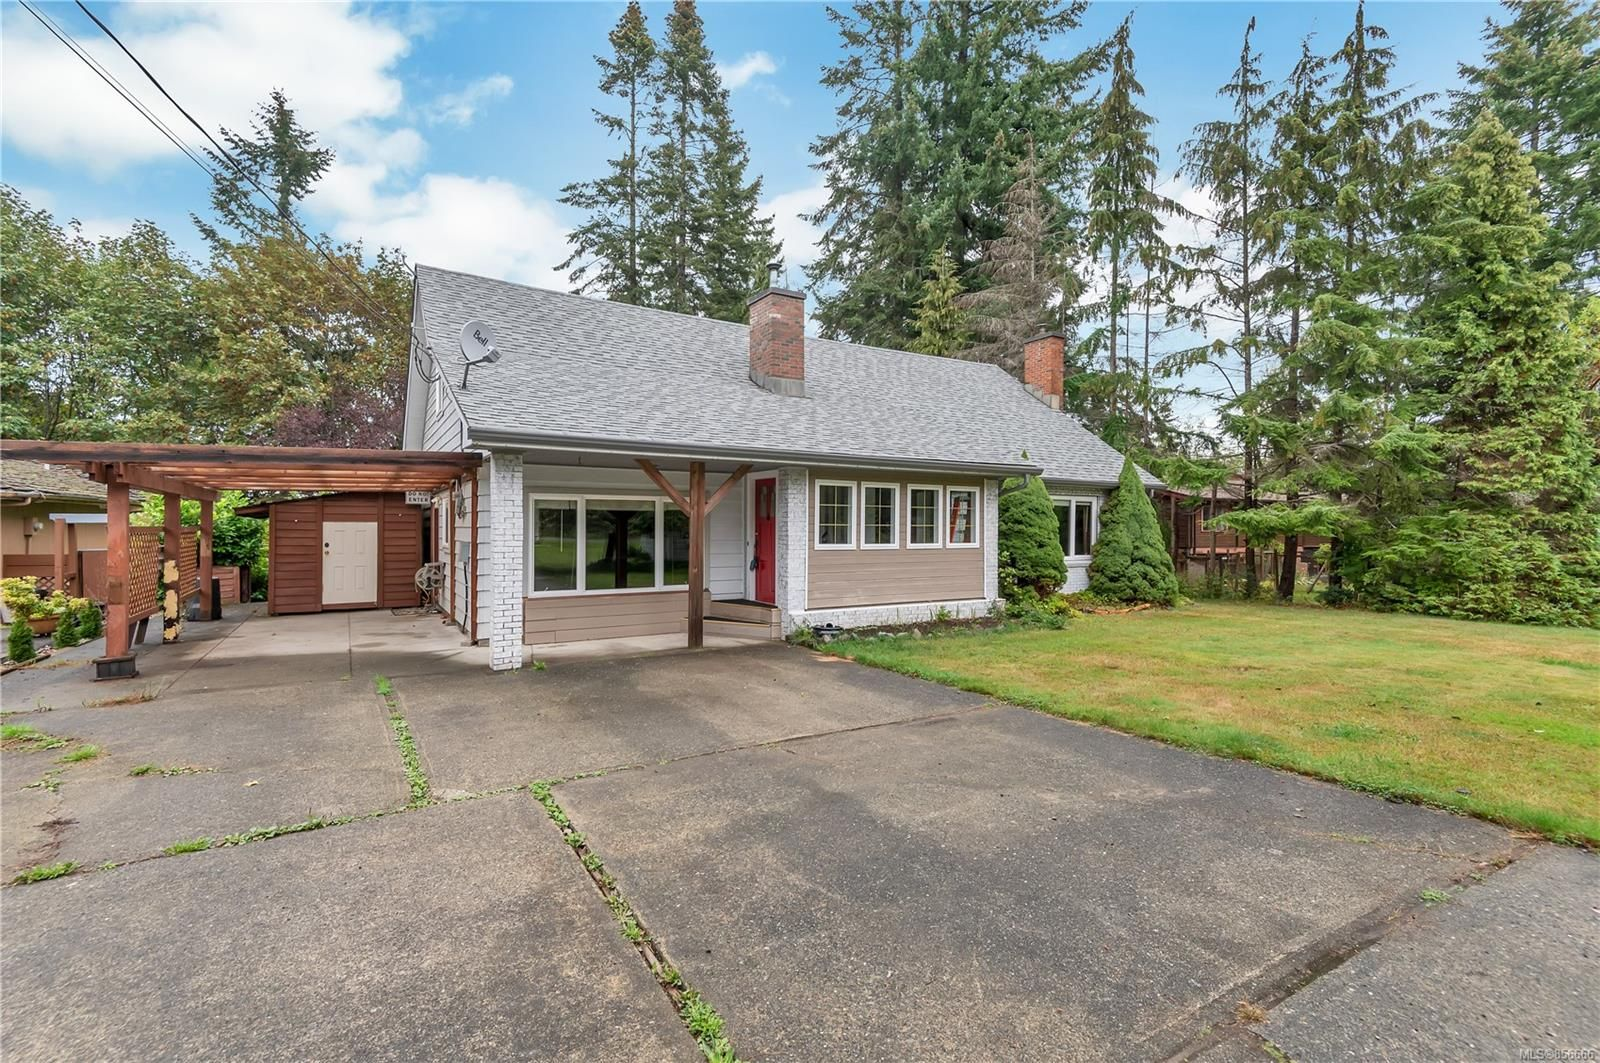 Photo 1: Photos: 2468 Oakes Rd in : CV Merville Black Creek House for sale (Comox Valley)  : MLS®# 856666